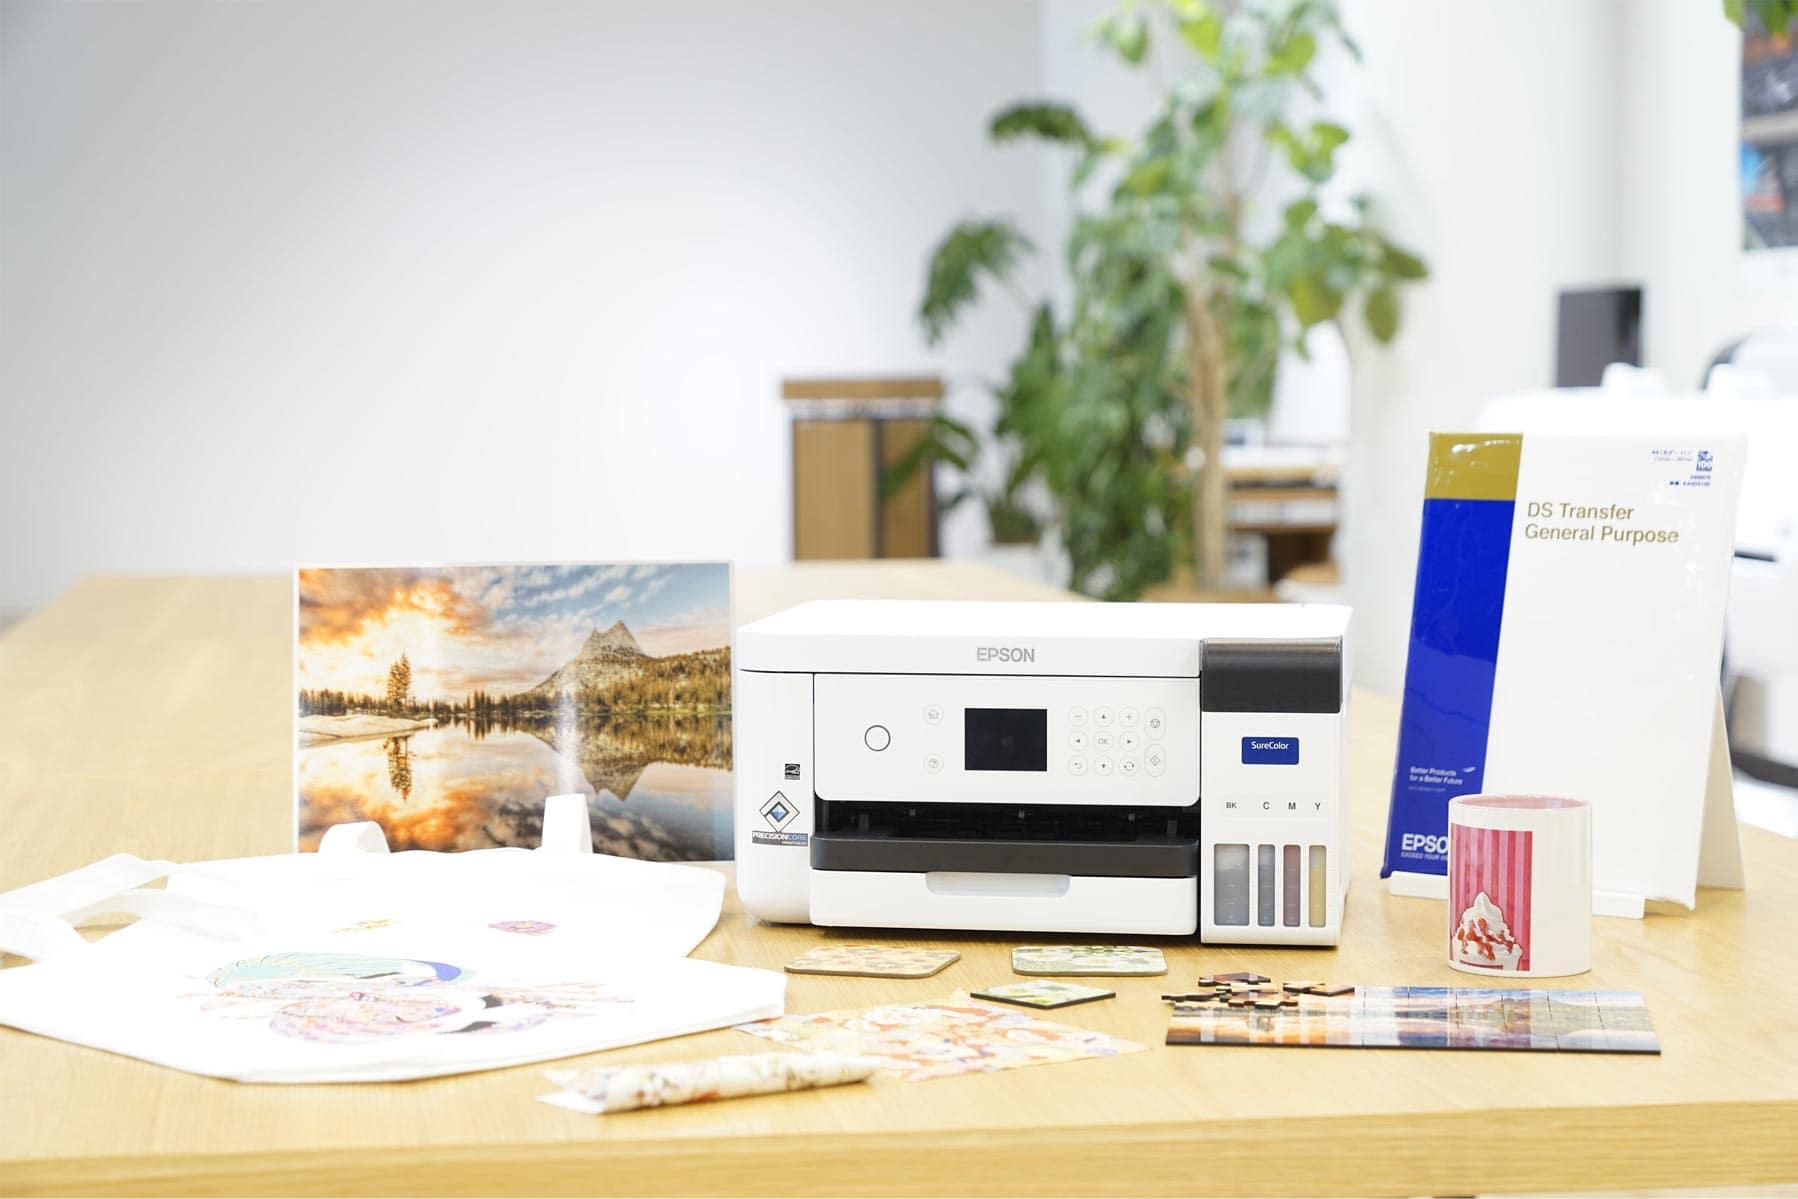 Epson SureColor SC-F100 - Neuer Dye-Sublimationsdrucker